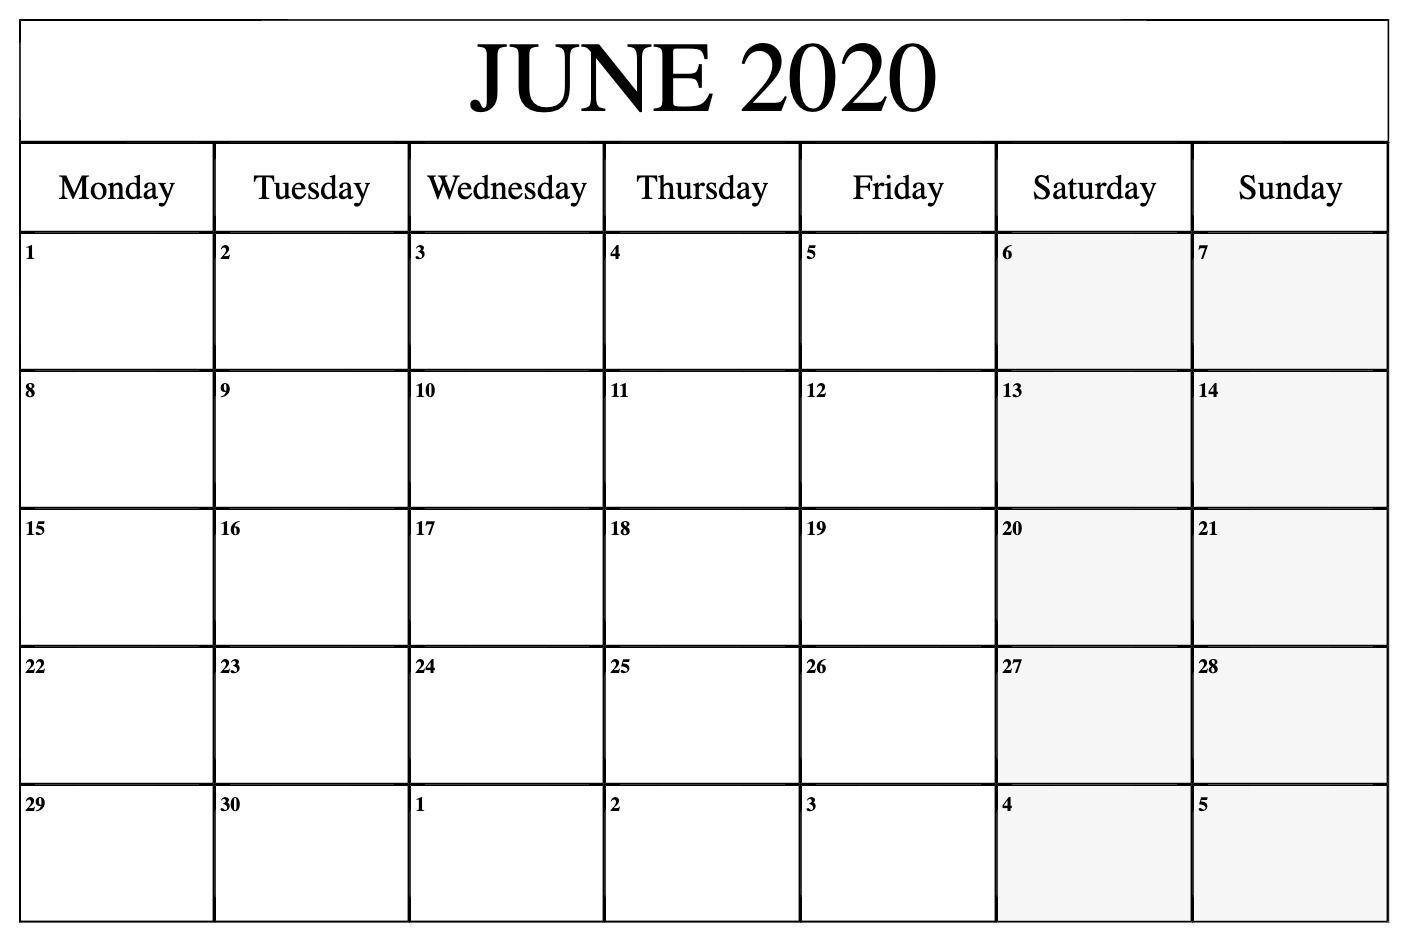 Free Editable June 2020 Calendar To Print Pdf Word Blank-Printable Calendar 2020 Monthly June July